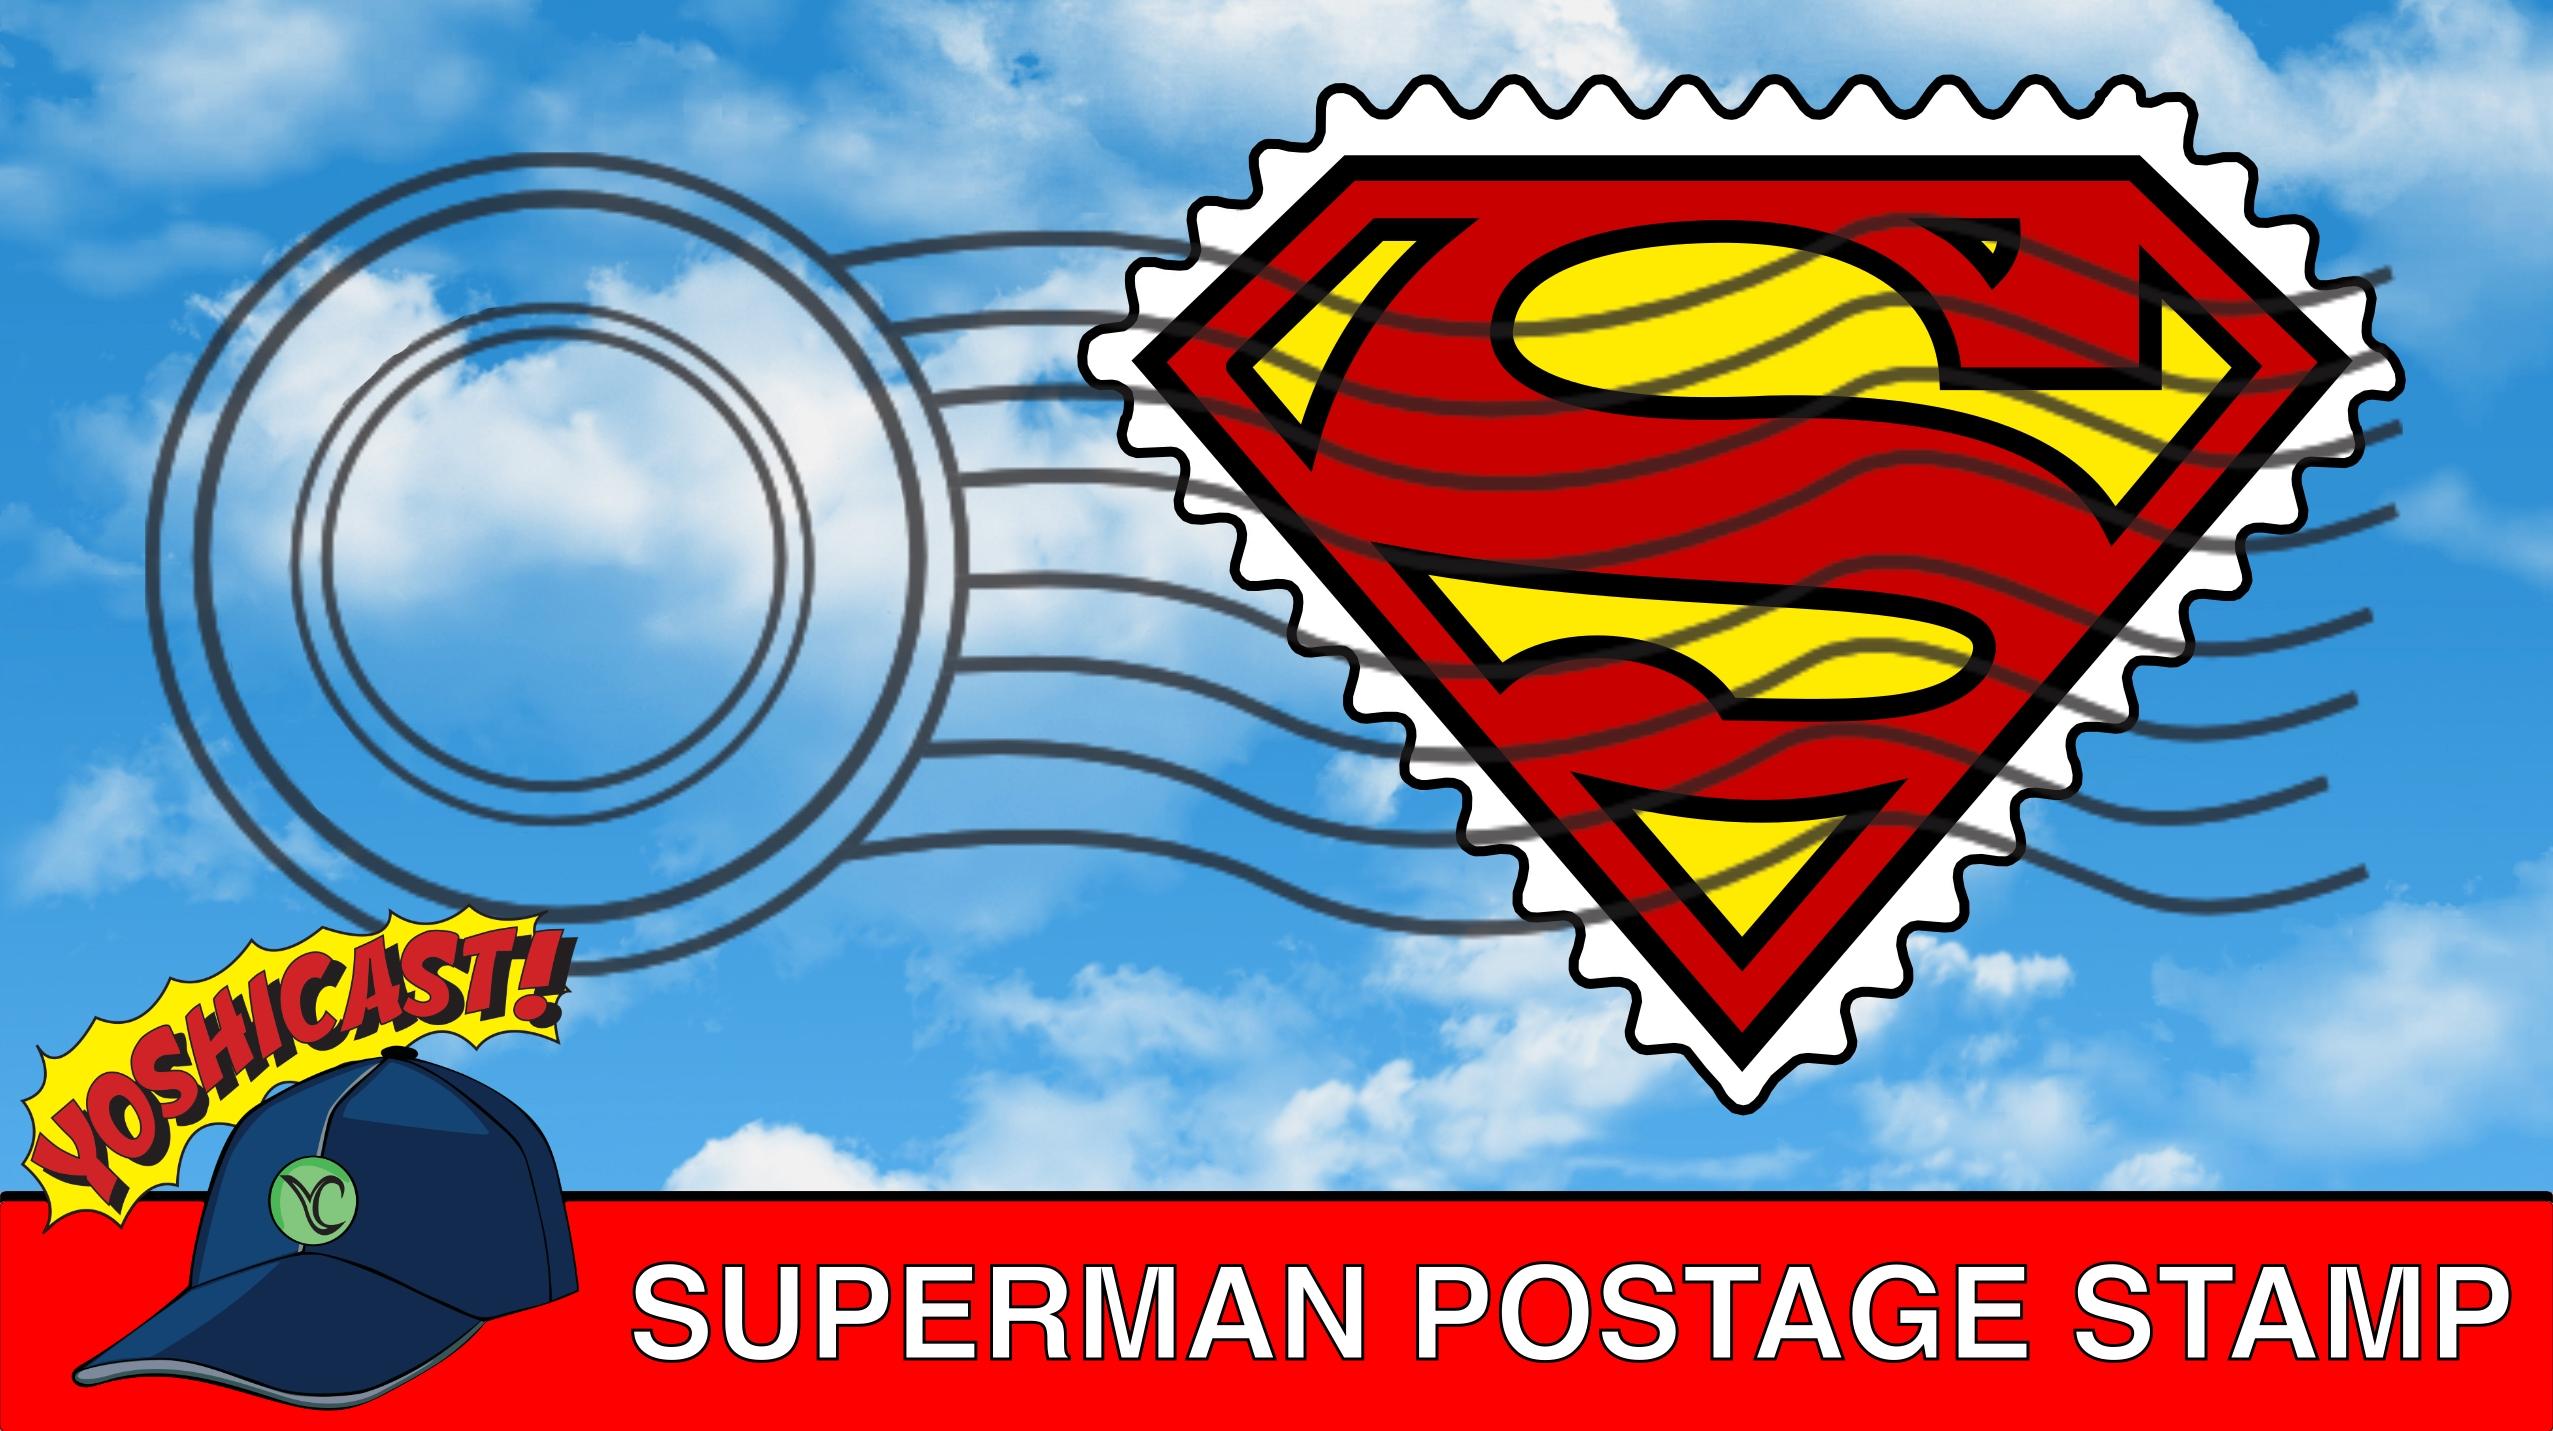 Superman Postage Stamp